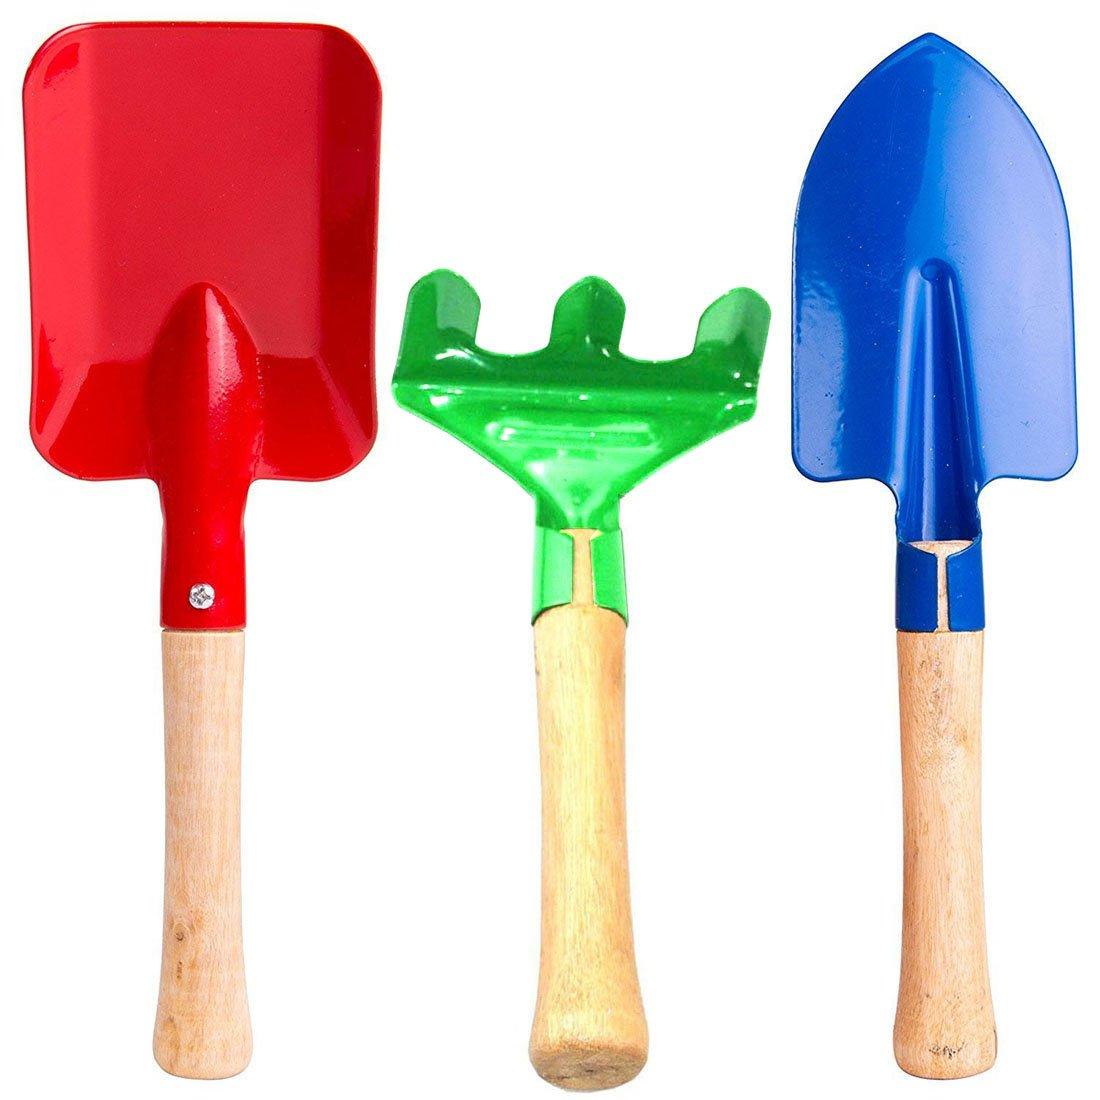 "Annymall Kids Garden Tools 3-Piece Set, 8"" Metal with Sturdy Wooden Handle Safe Gardening Tools Trowel, Rake & Shovel for Children Kids Beach Sandbox Toy"